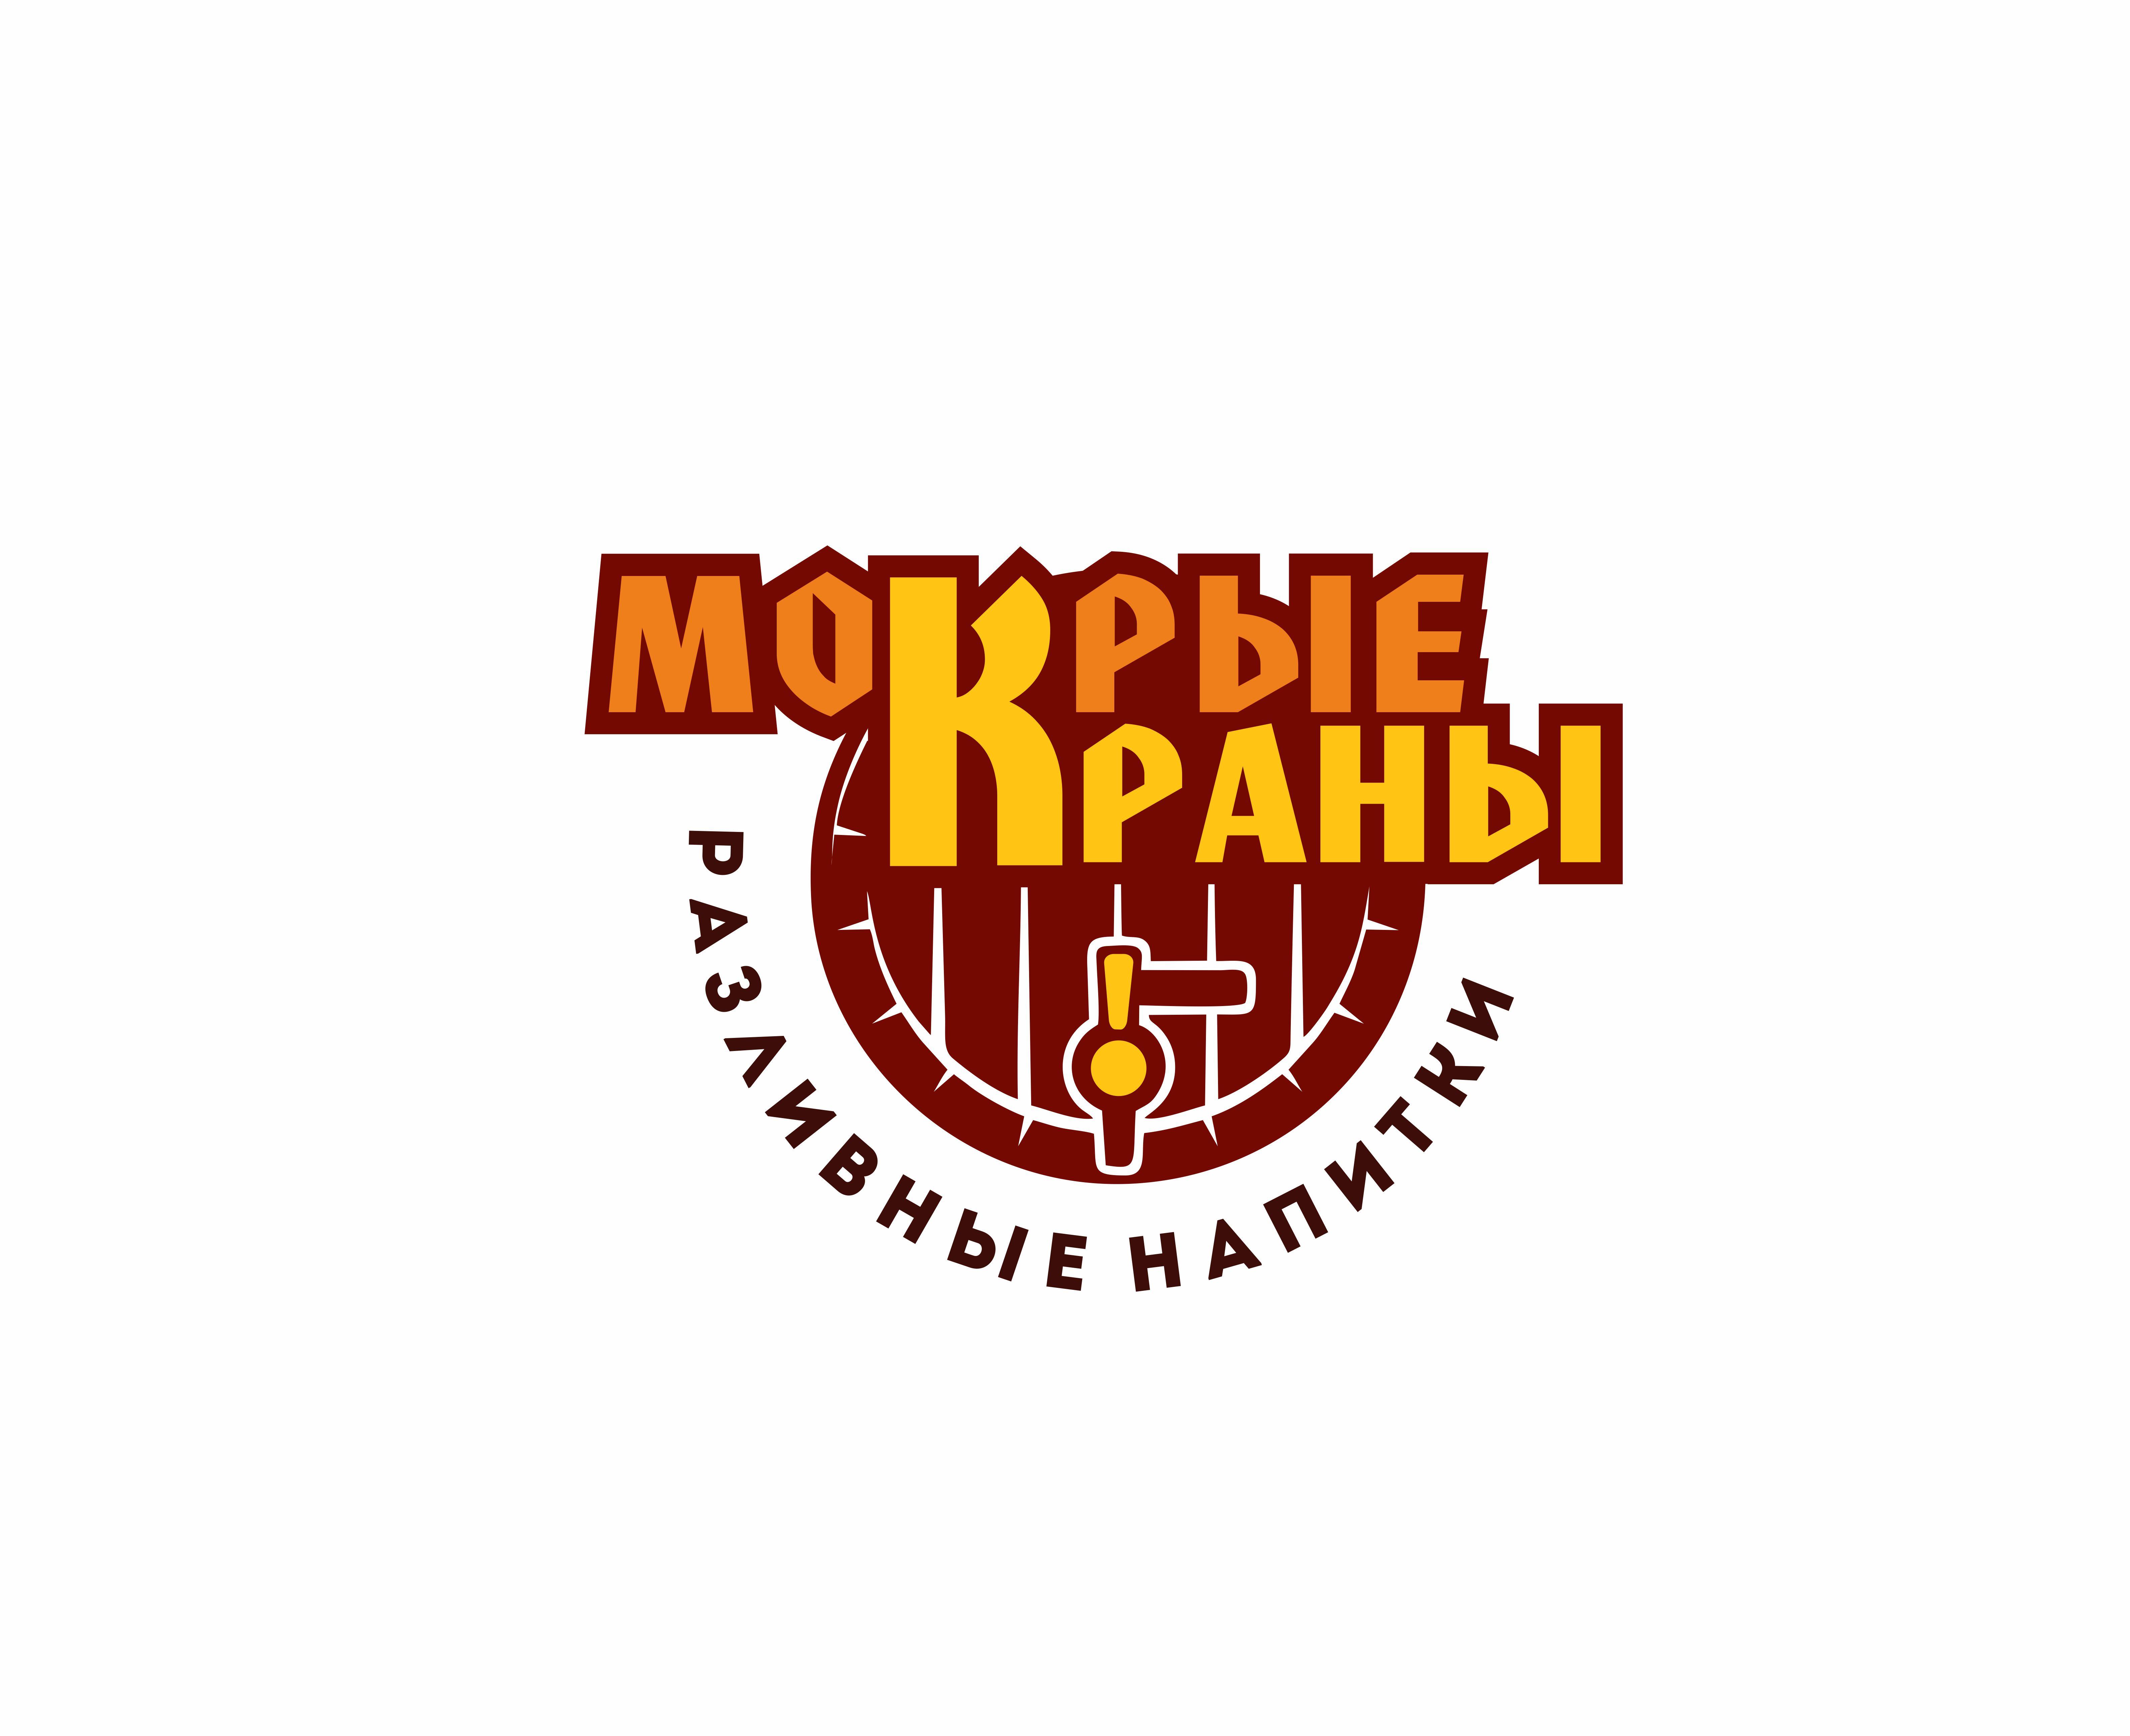 Вывеска/логотип для пивного магазина фото f_755601e1630a5b13.jpg